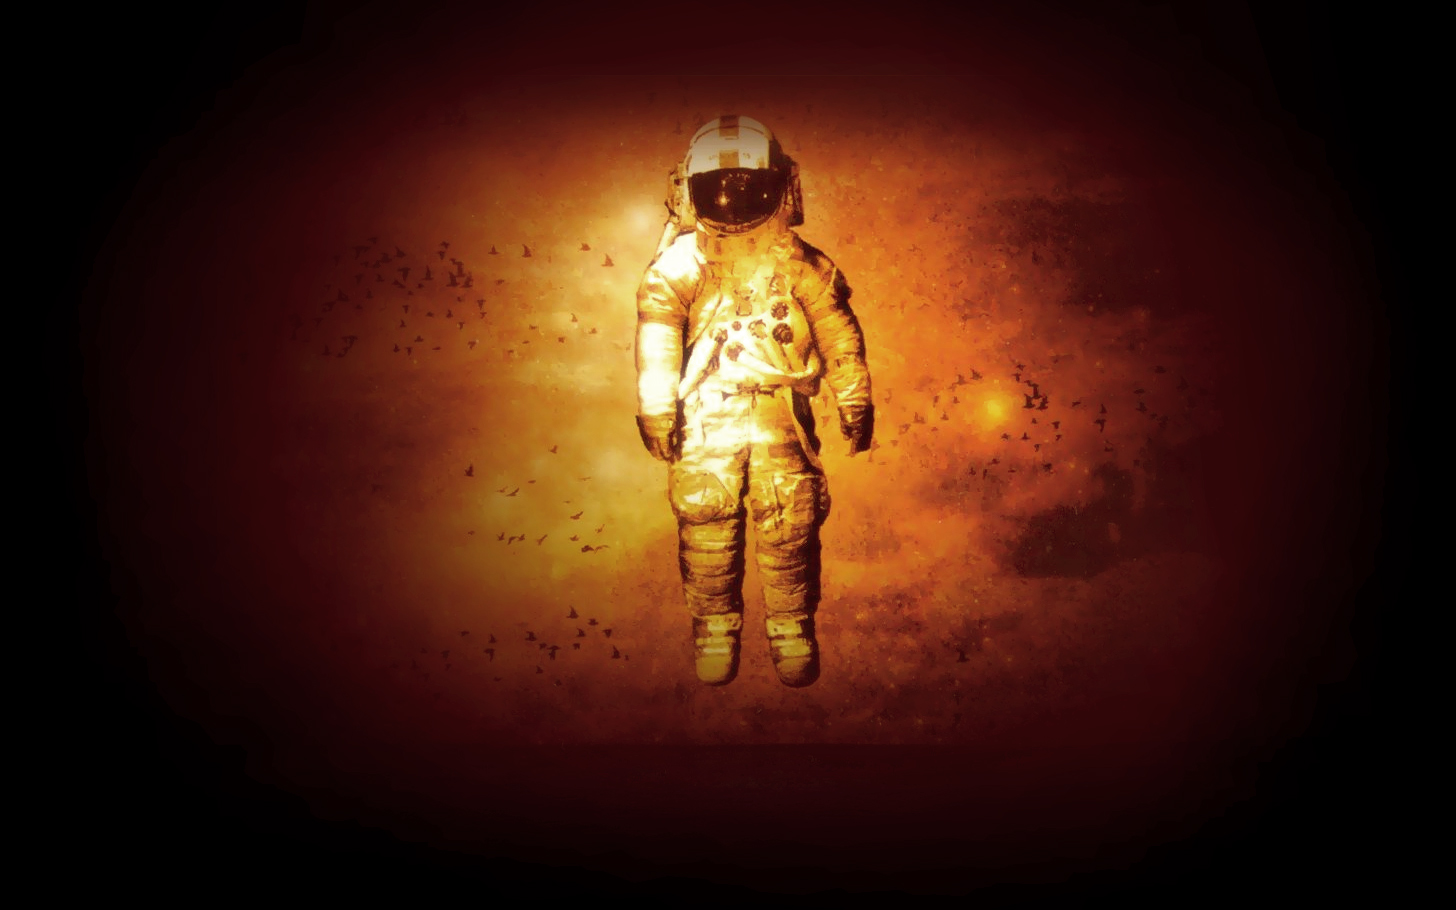 astronauts brand new deja astronaut HD Wallpaper   Companies Brands 1456x910